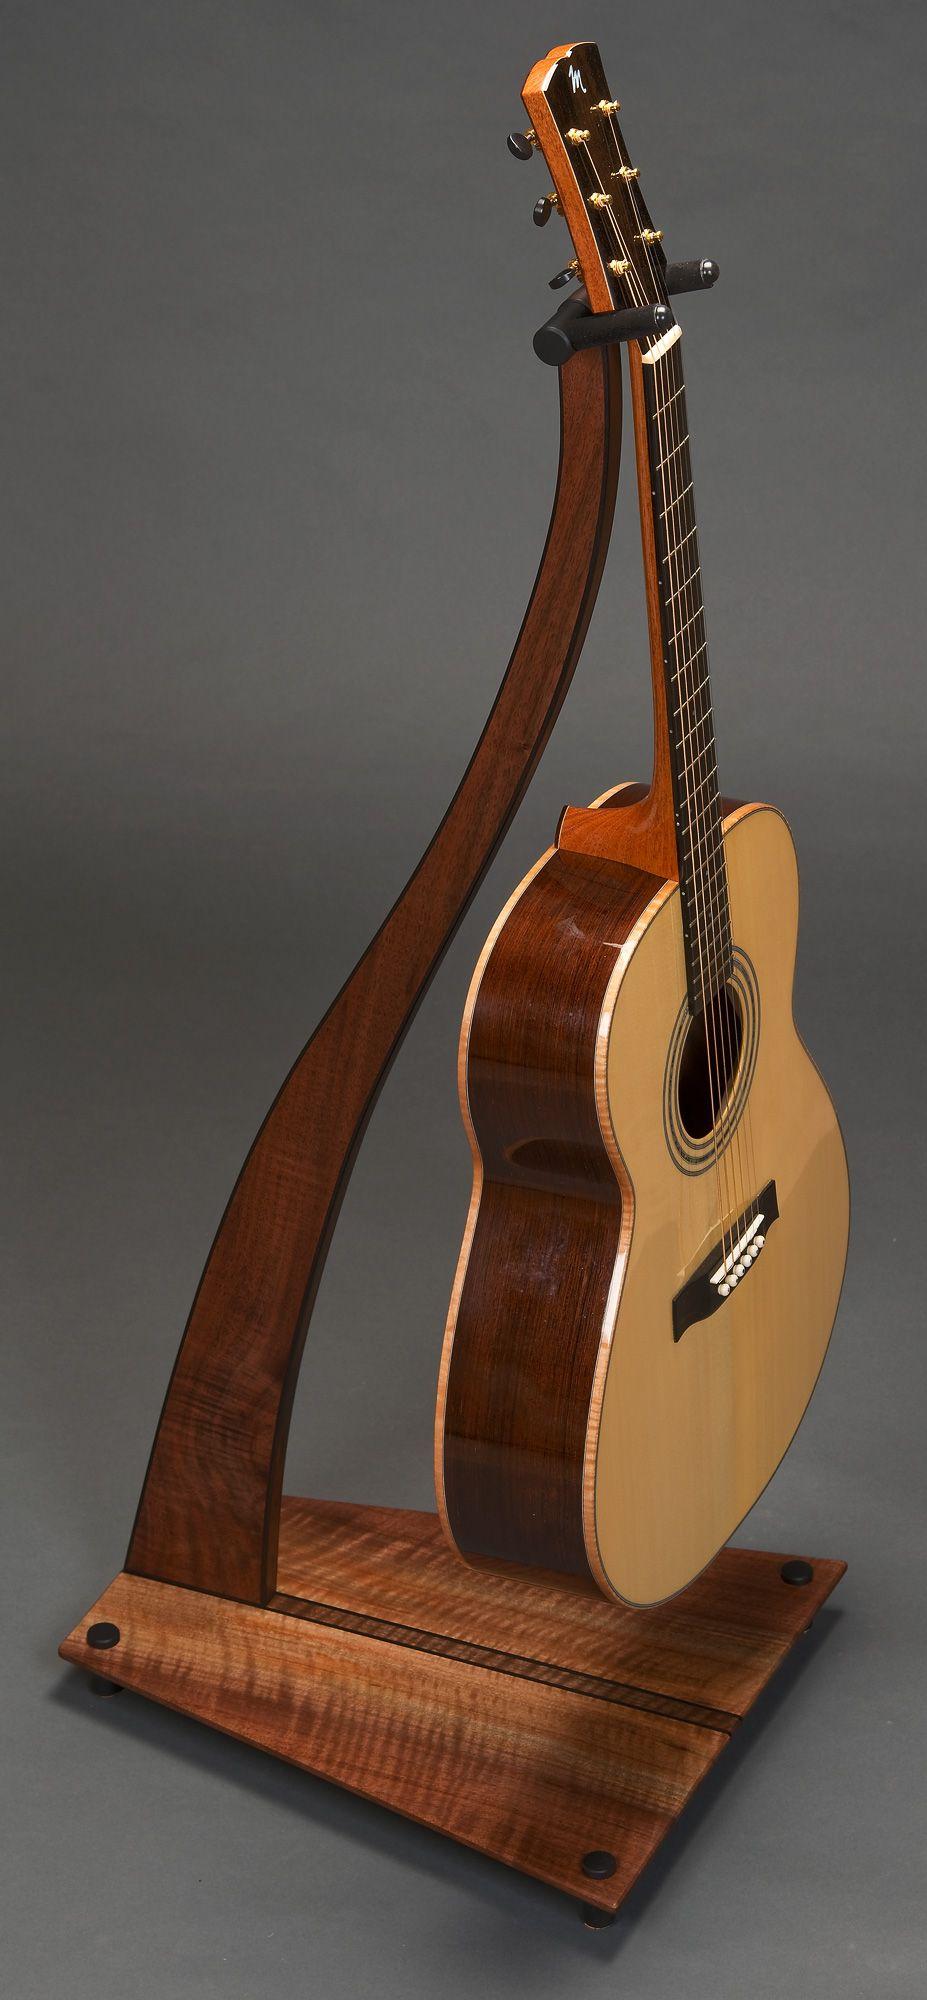 Guitar Stand Designs : Sm design guitar stand claro walnut with double ebony